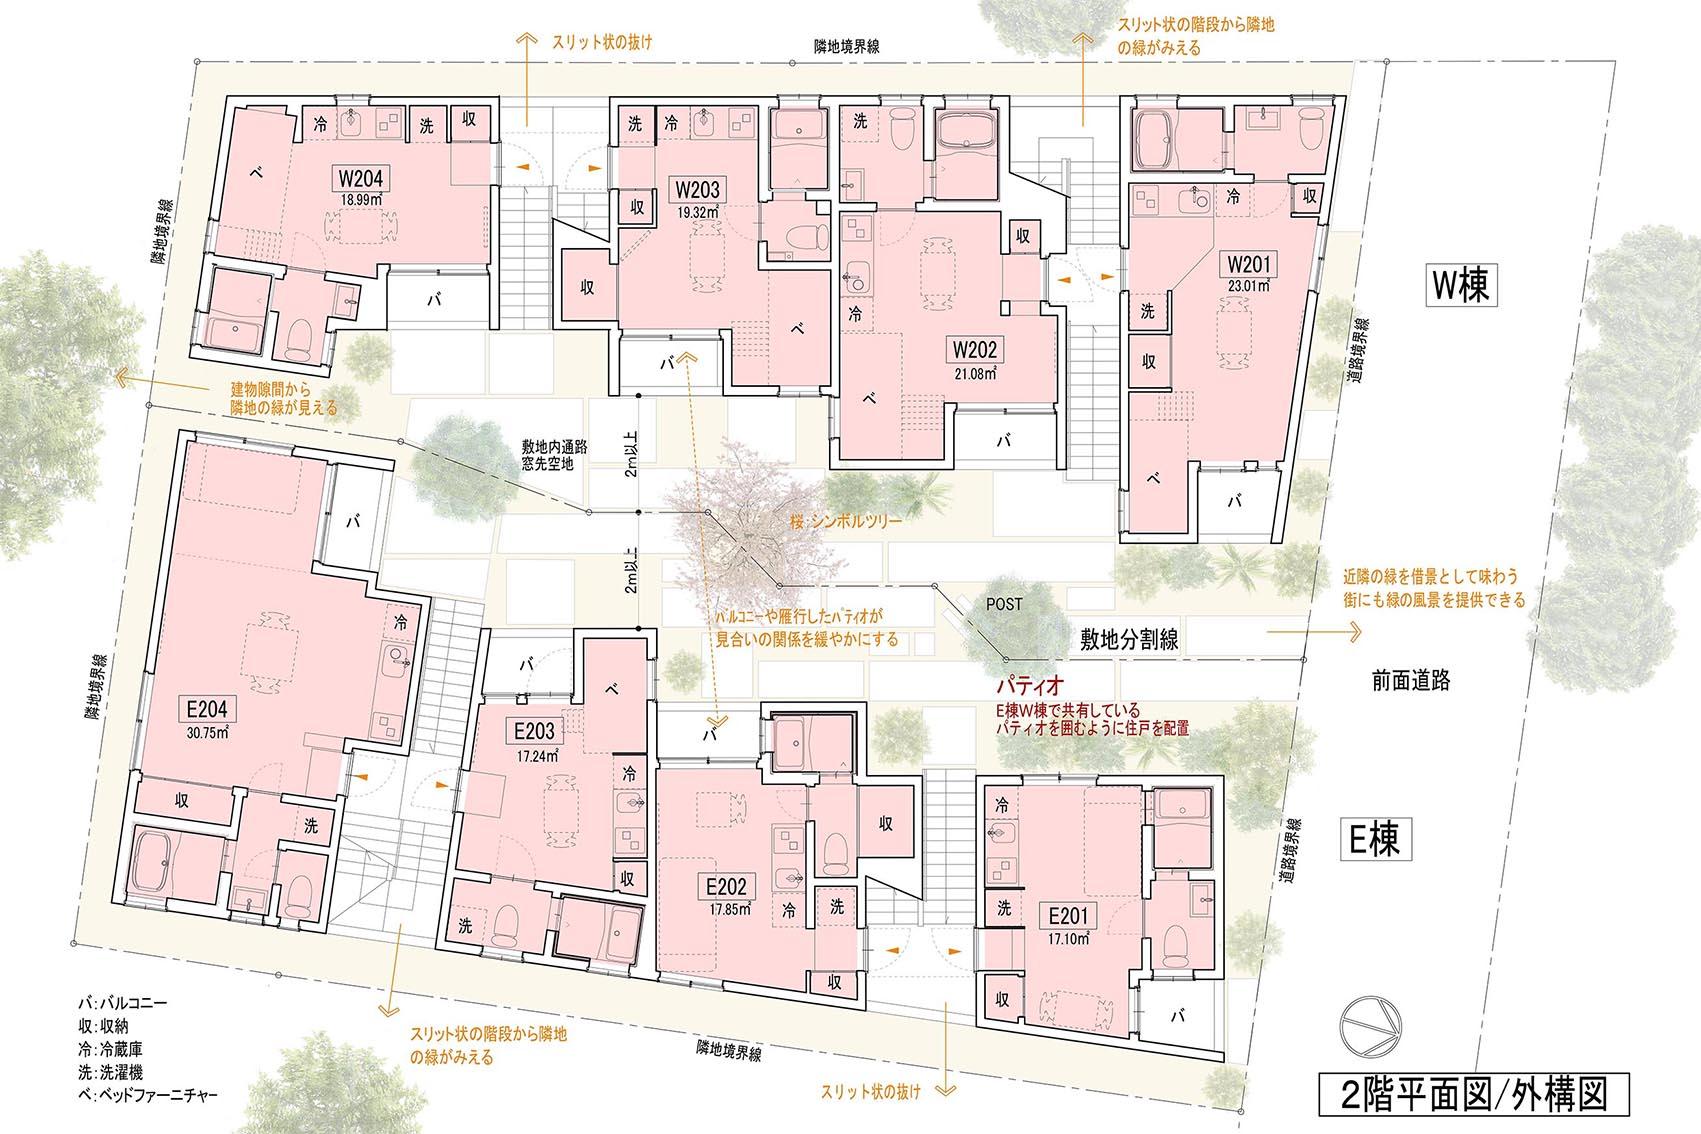 C:UsersmukoyDropboxWORKS住宅シマダ#梅が丘2プ